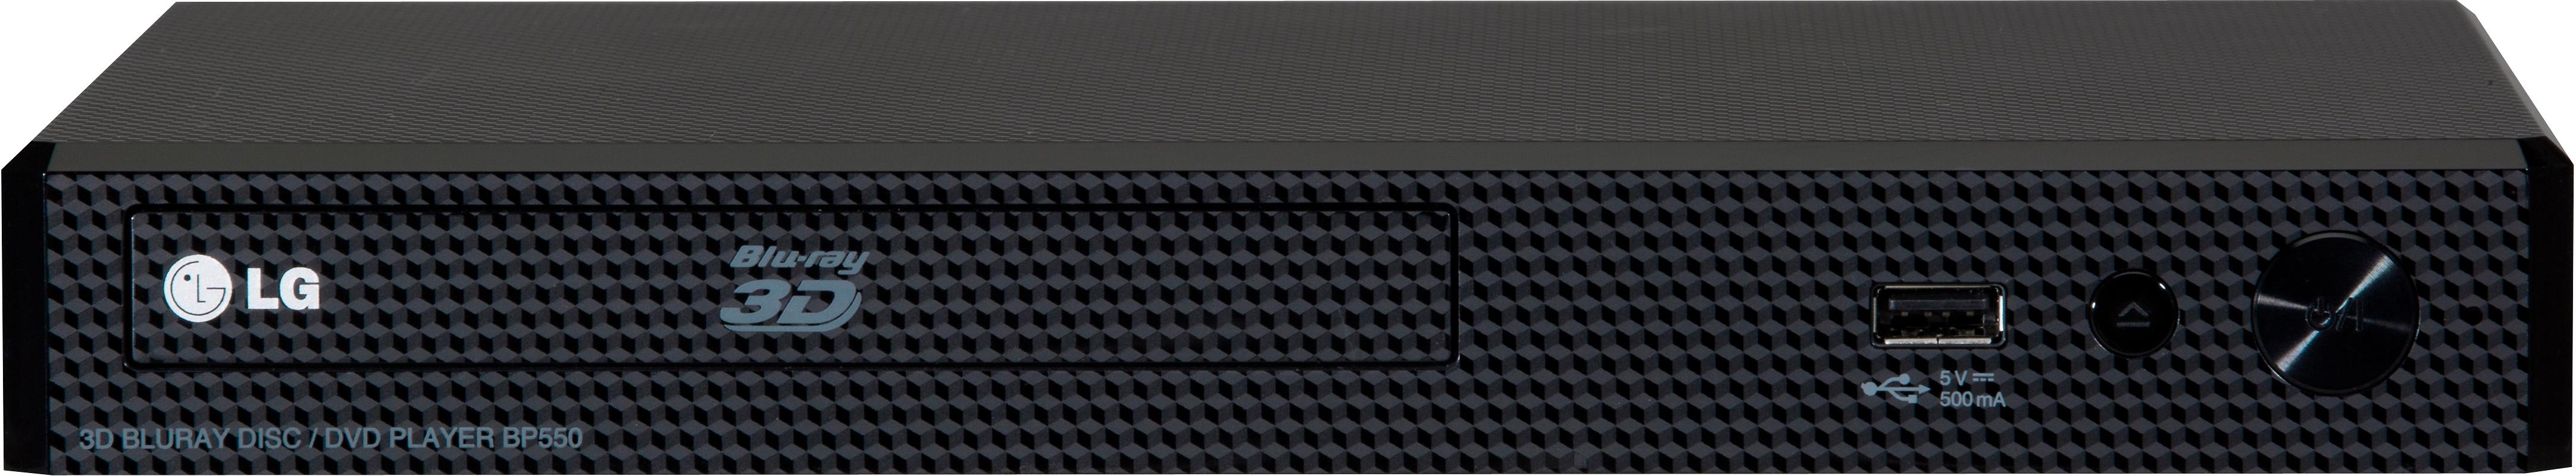 LG BP450 3D Blu-ray speler, 3D online kopen op otto.nl